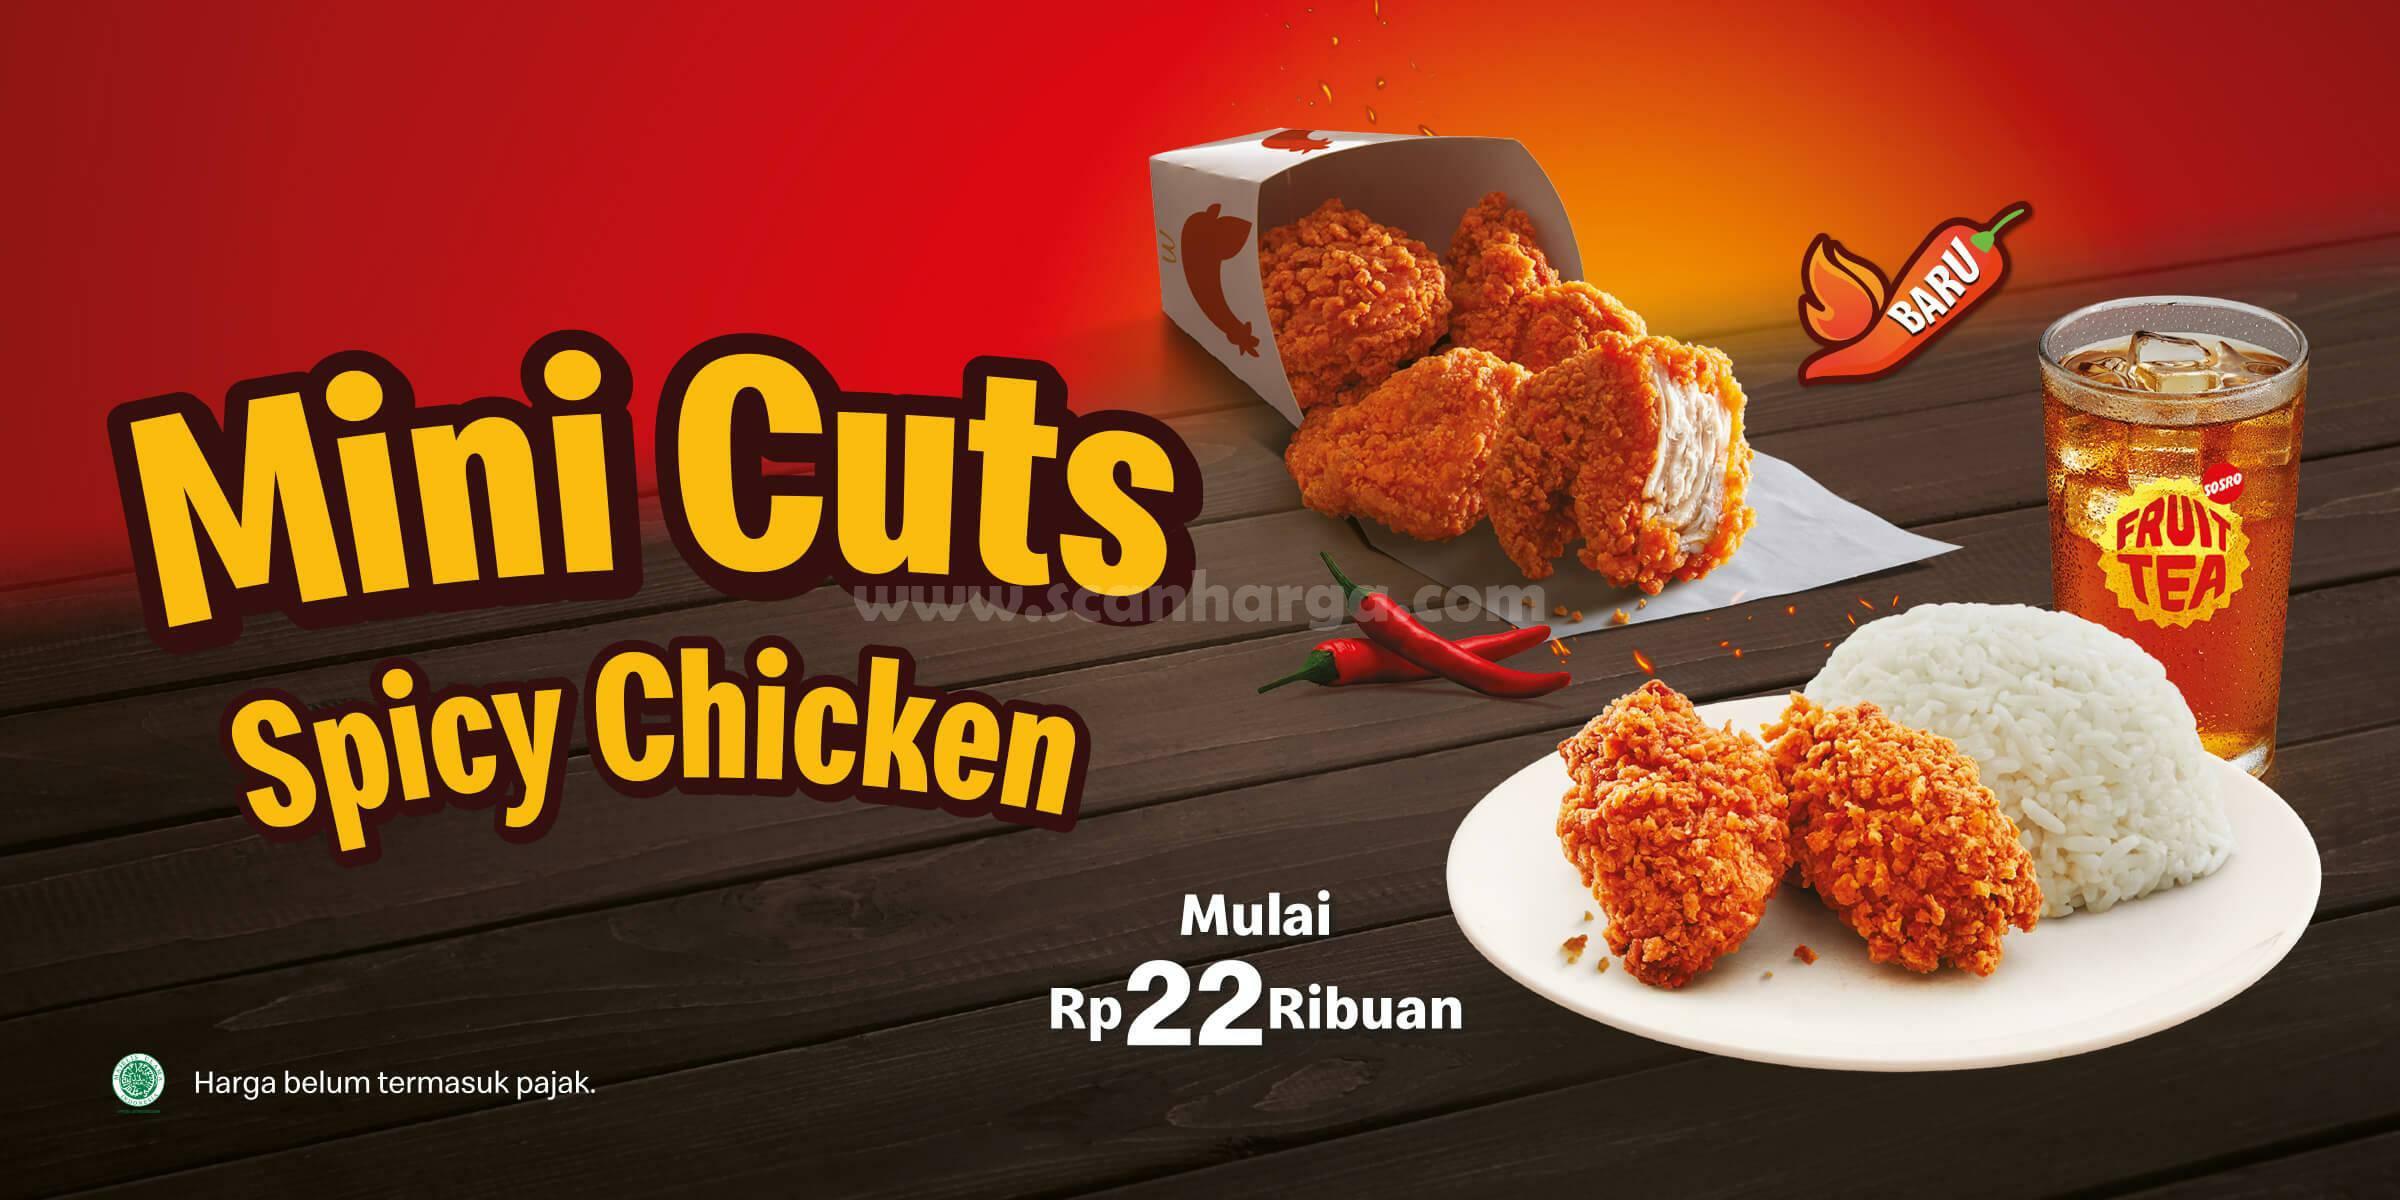 McDonalds Mini Cuts Spicy Chicken! Promo Harga Spesial mulai dari 22Ribu-an